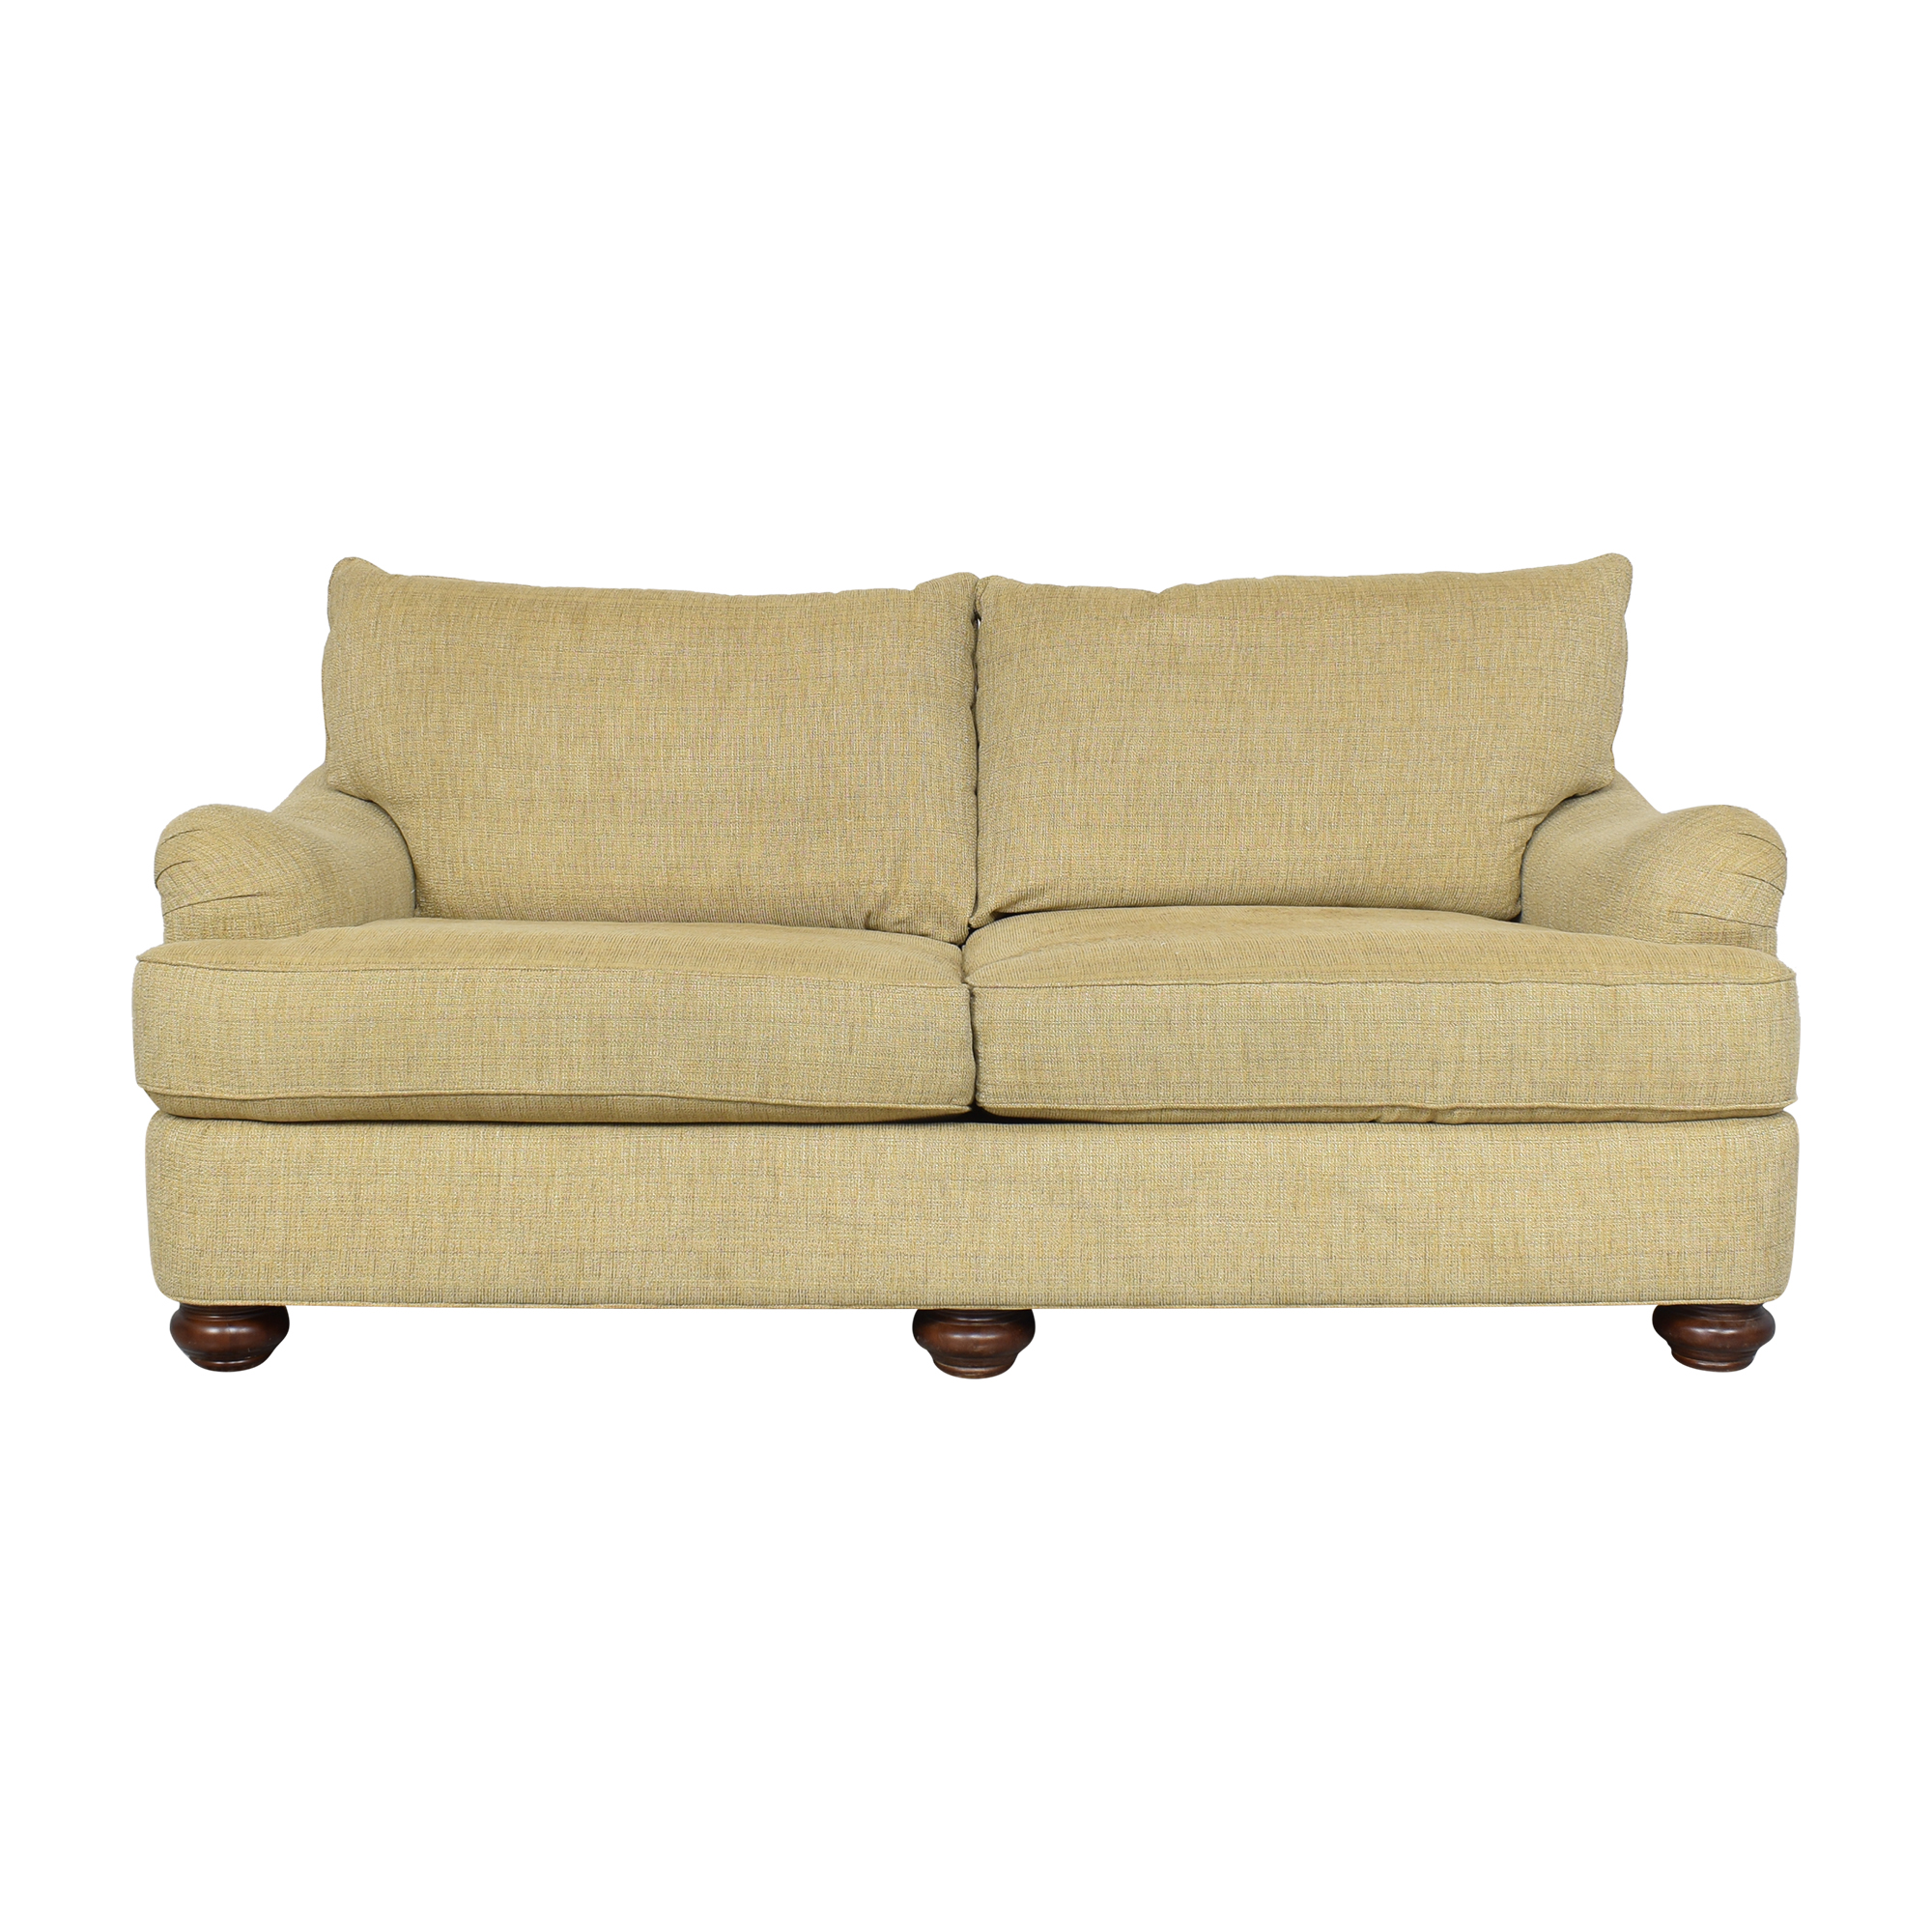 Thomasville Thomasville English Roll Arm Sofa ct